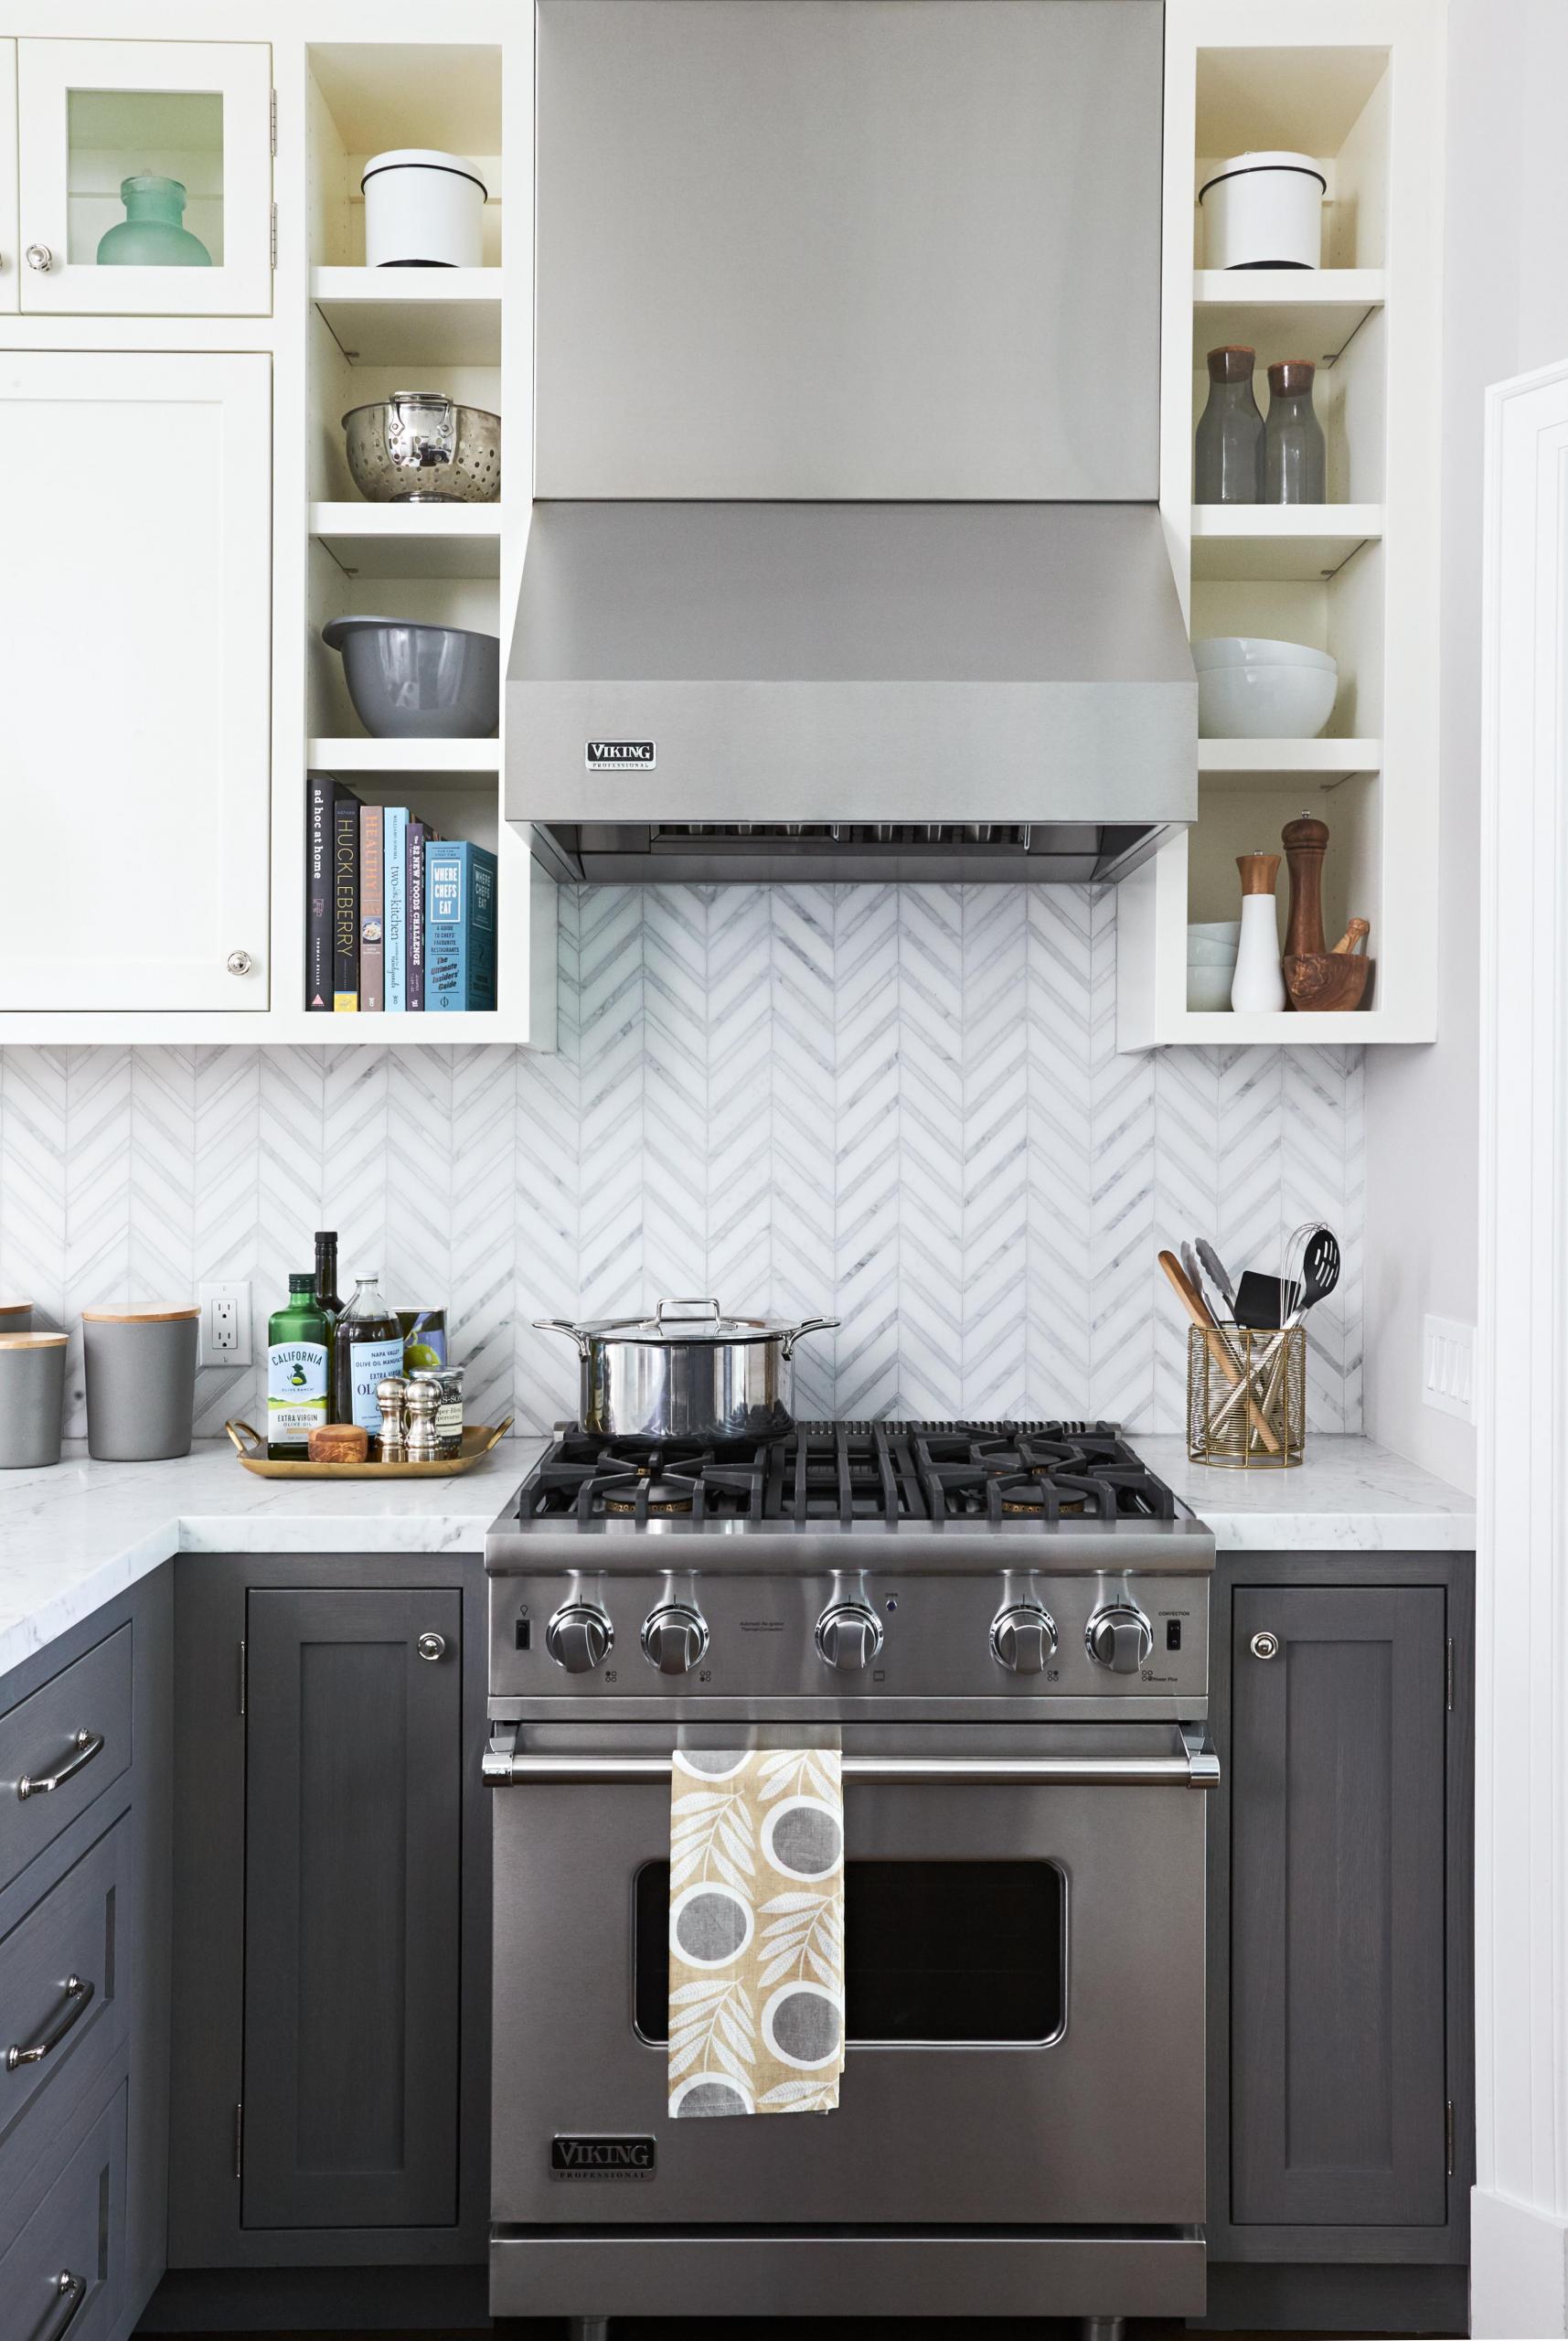 10 Colorful Kitchen Backsplash Ideas White Cabinets In 2020 Kitchen Backsplash Designs Unique Kitchen Backsplash Kitchen Tiles Design